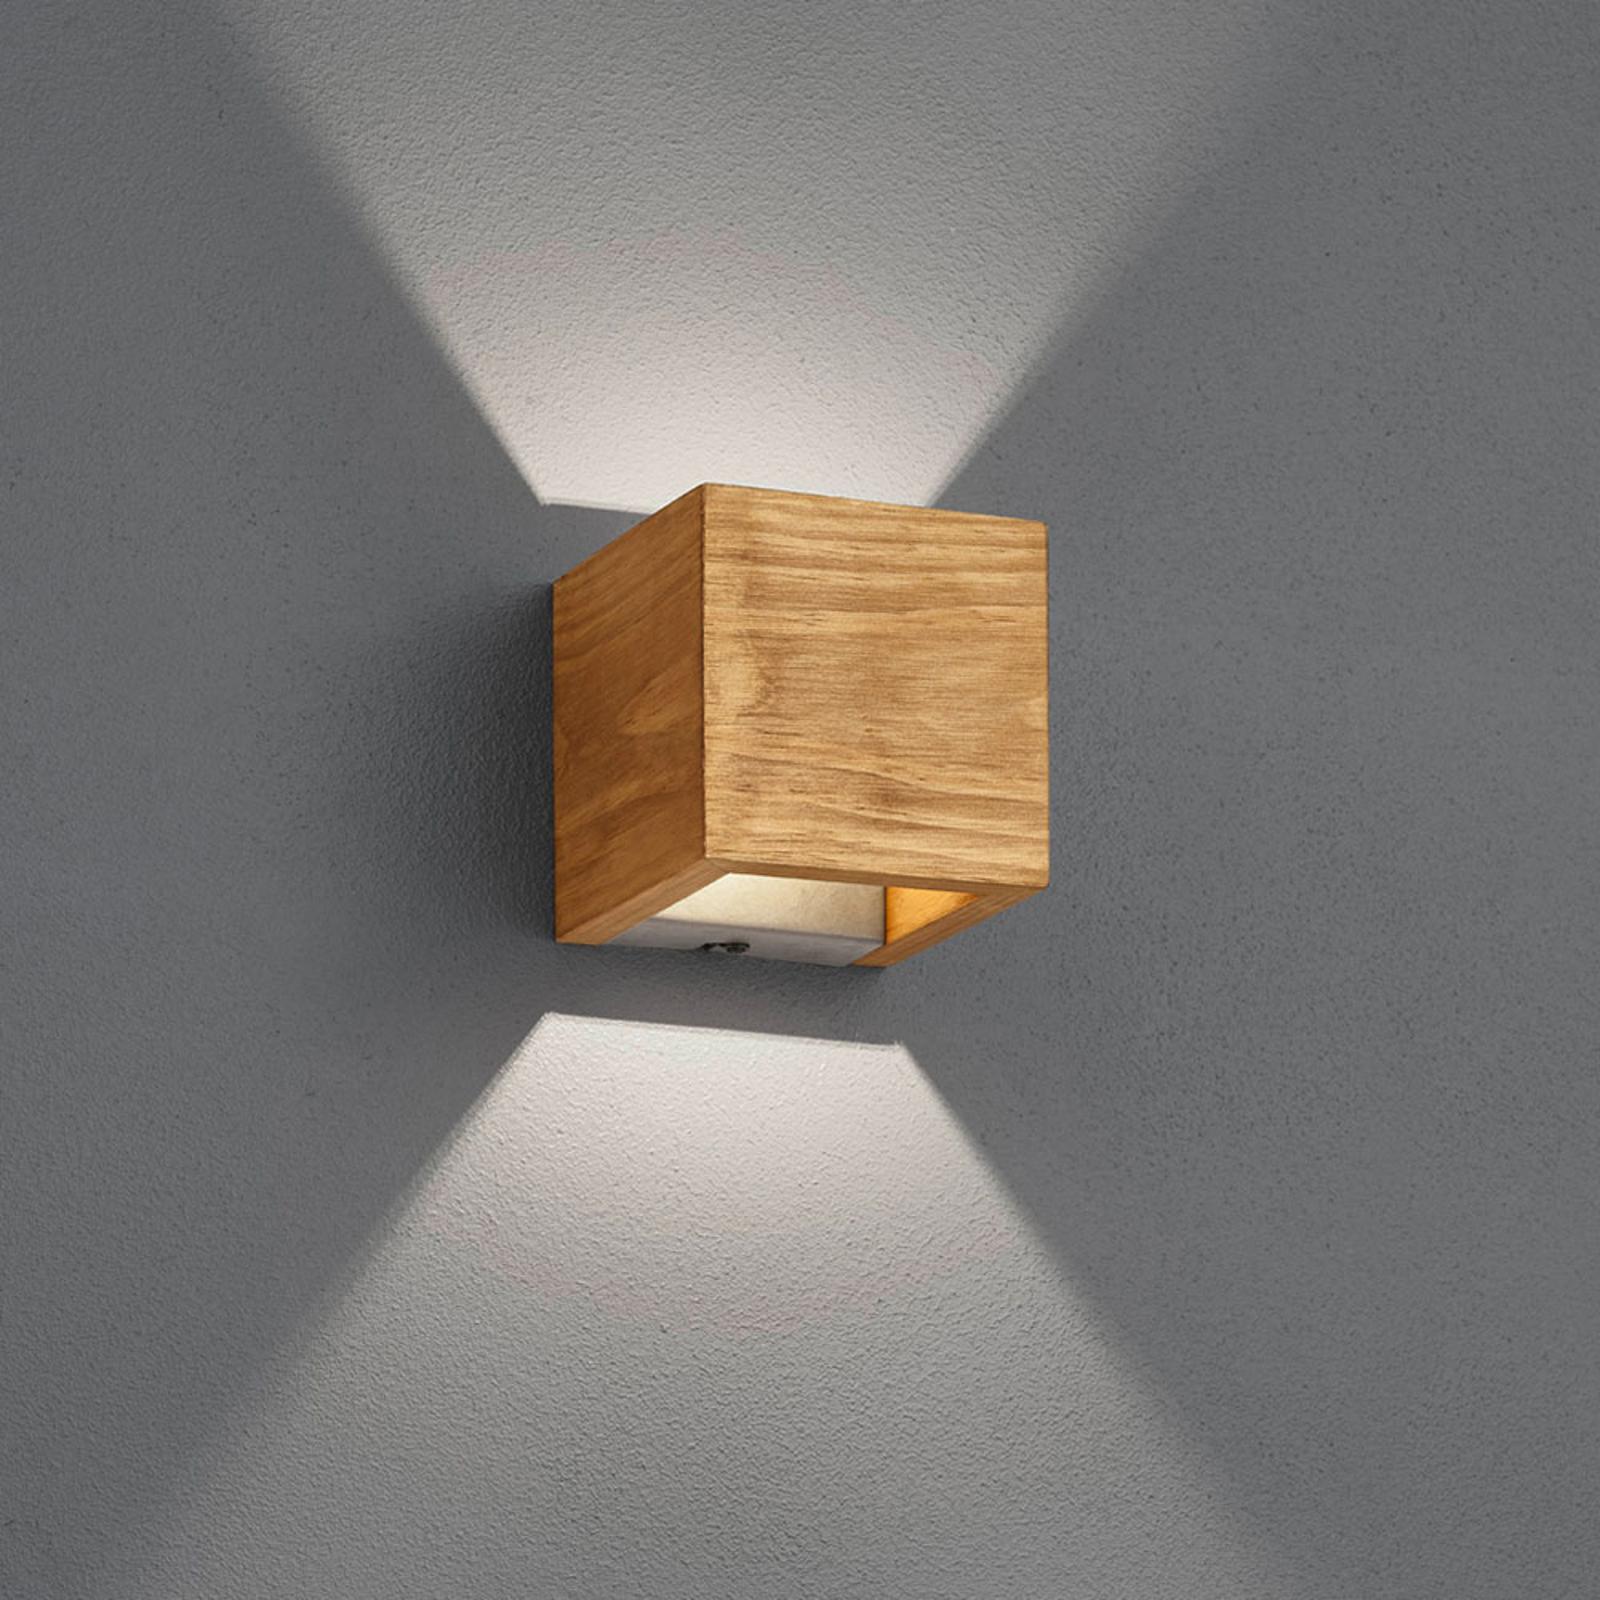 LED-seinävalaisin Brad puusta, ylös/alas, 11x11 cm